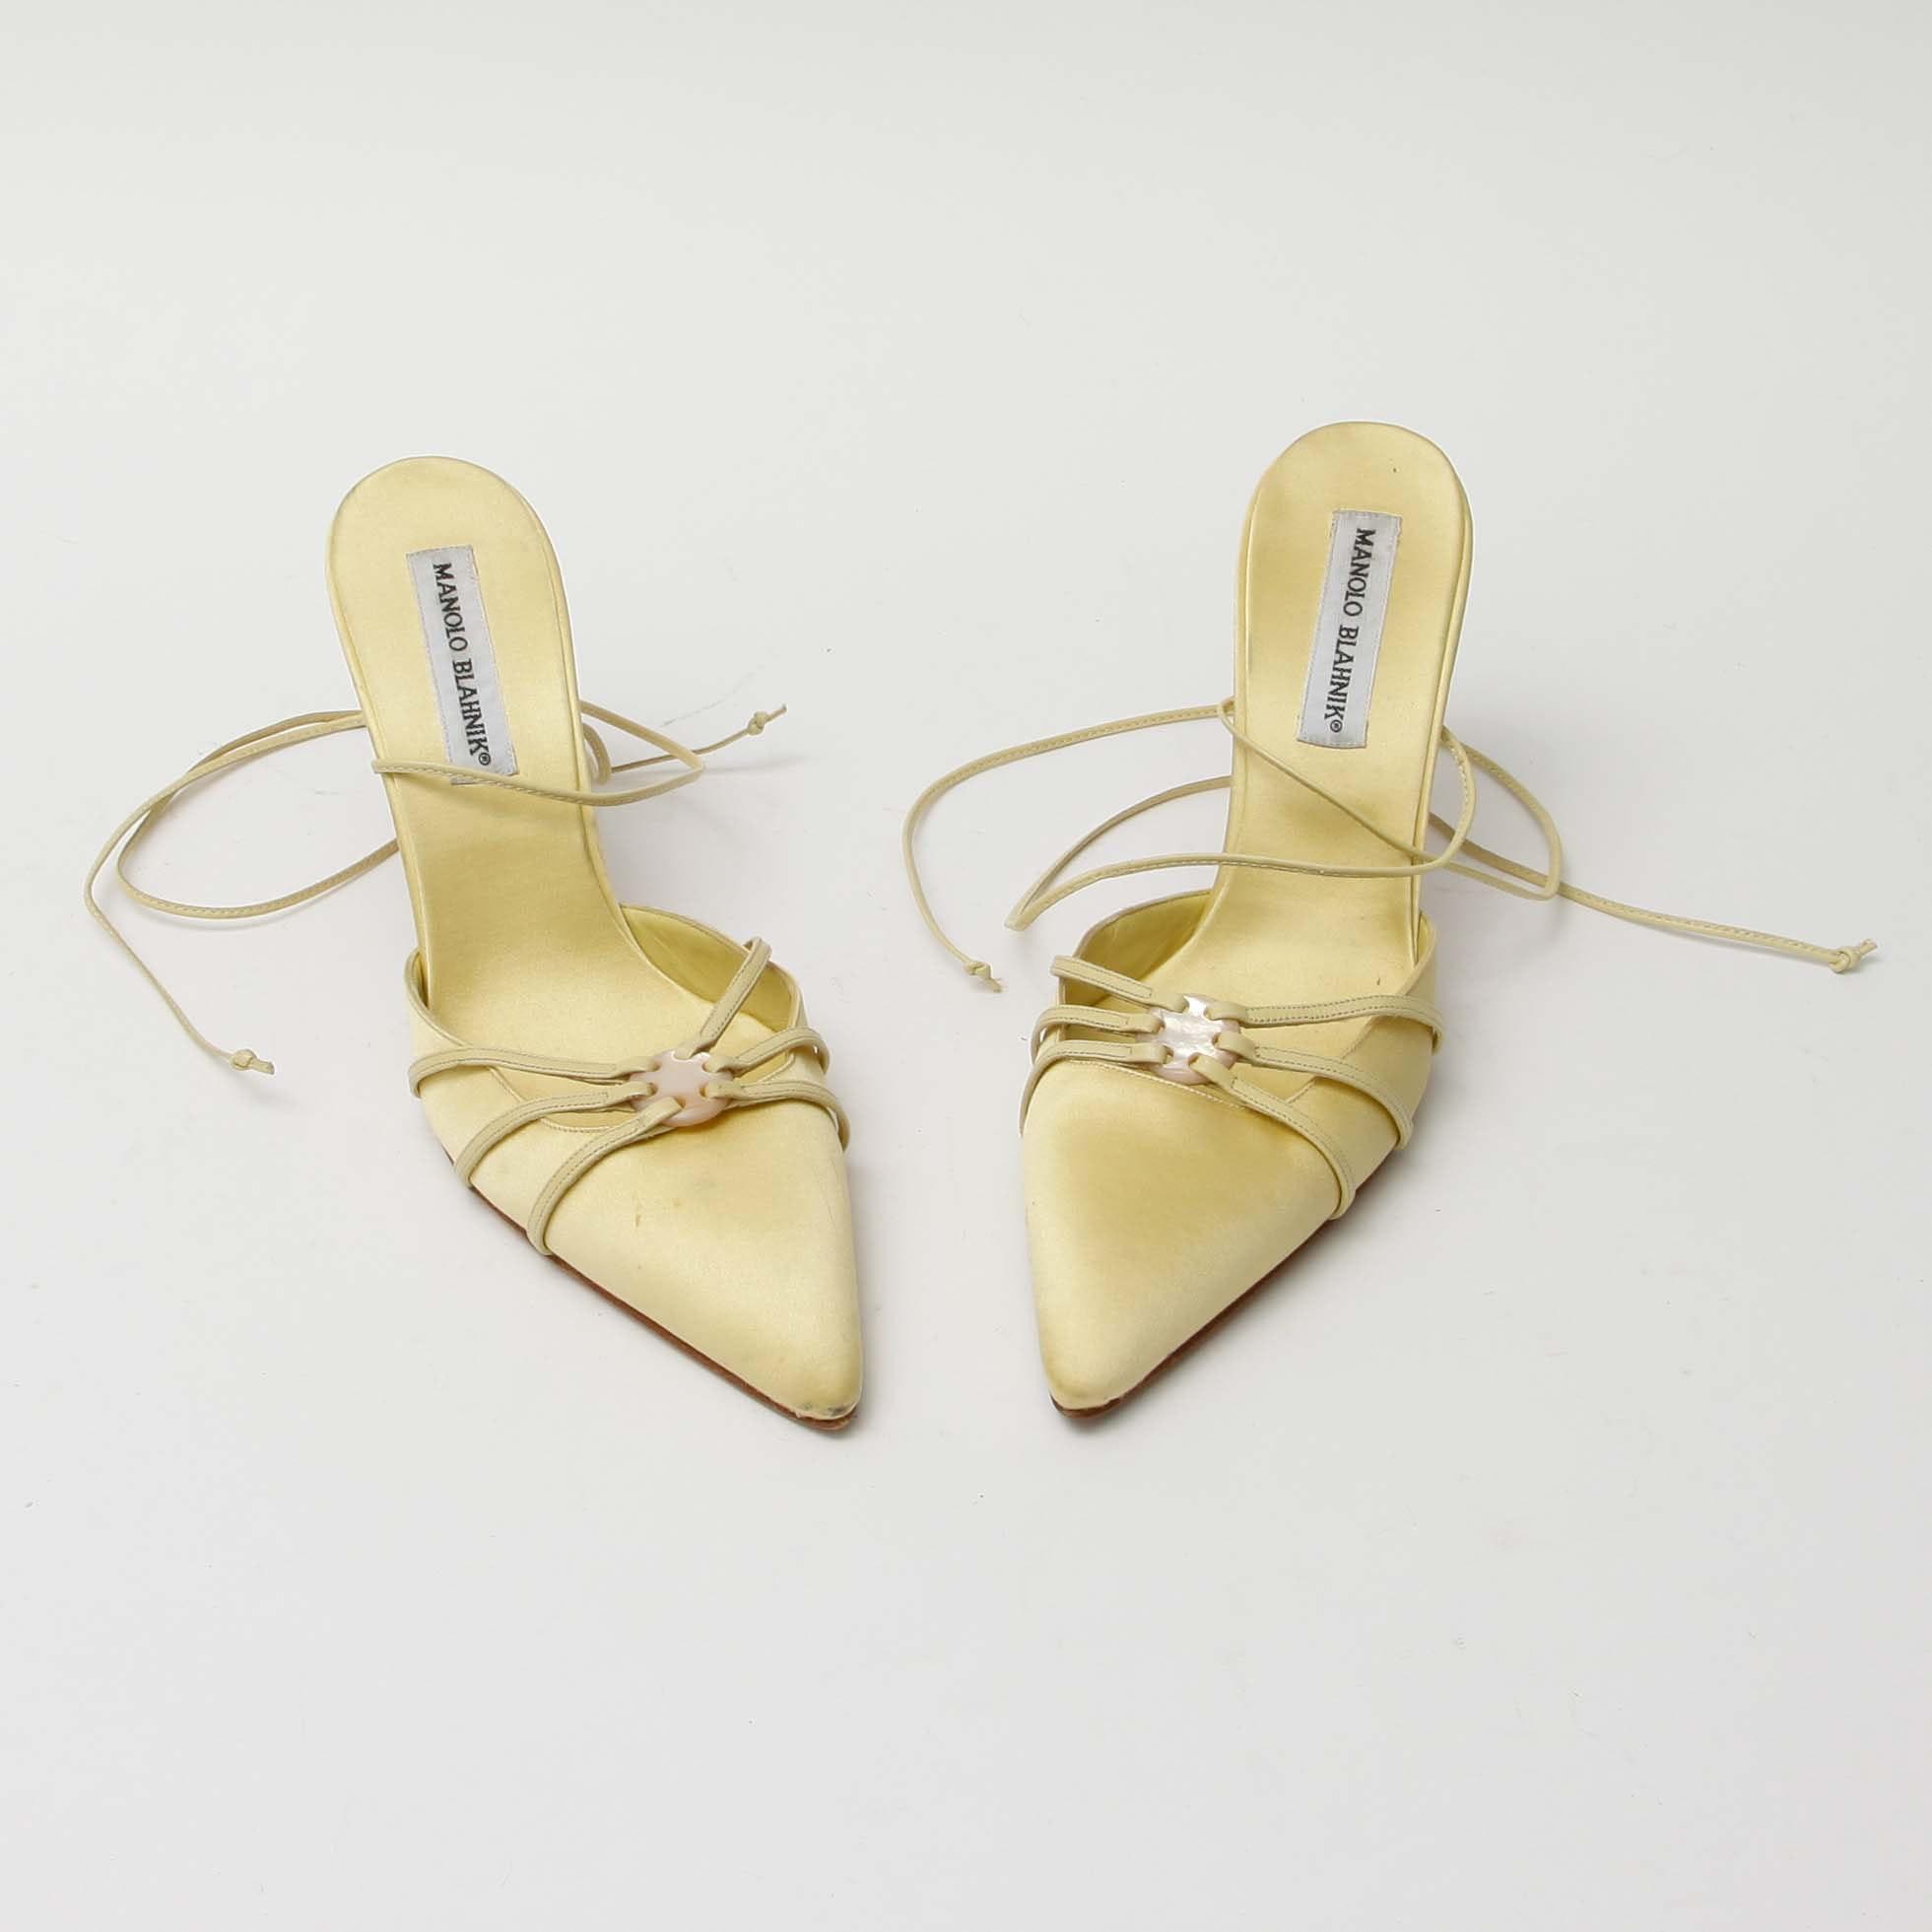 Manolo Blahnik High Heel Shoes